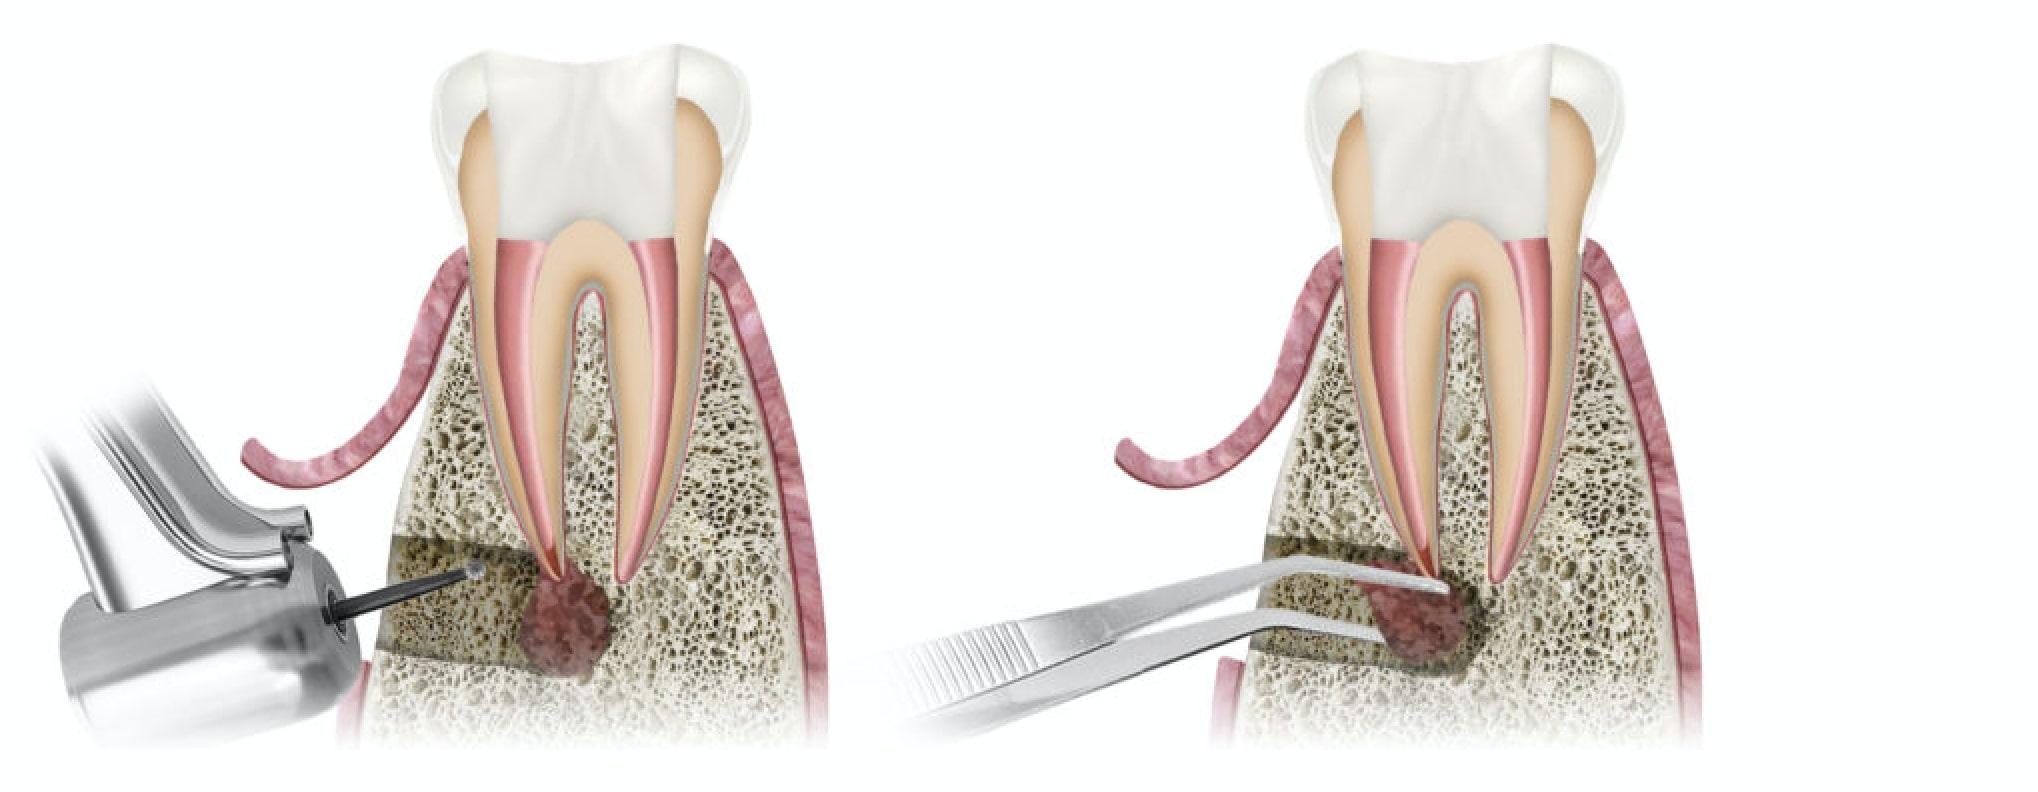 Wurzelspitzenresektion bei Zahnwurzelentzündung